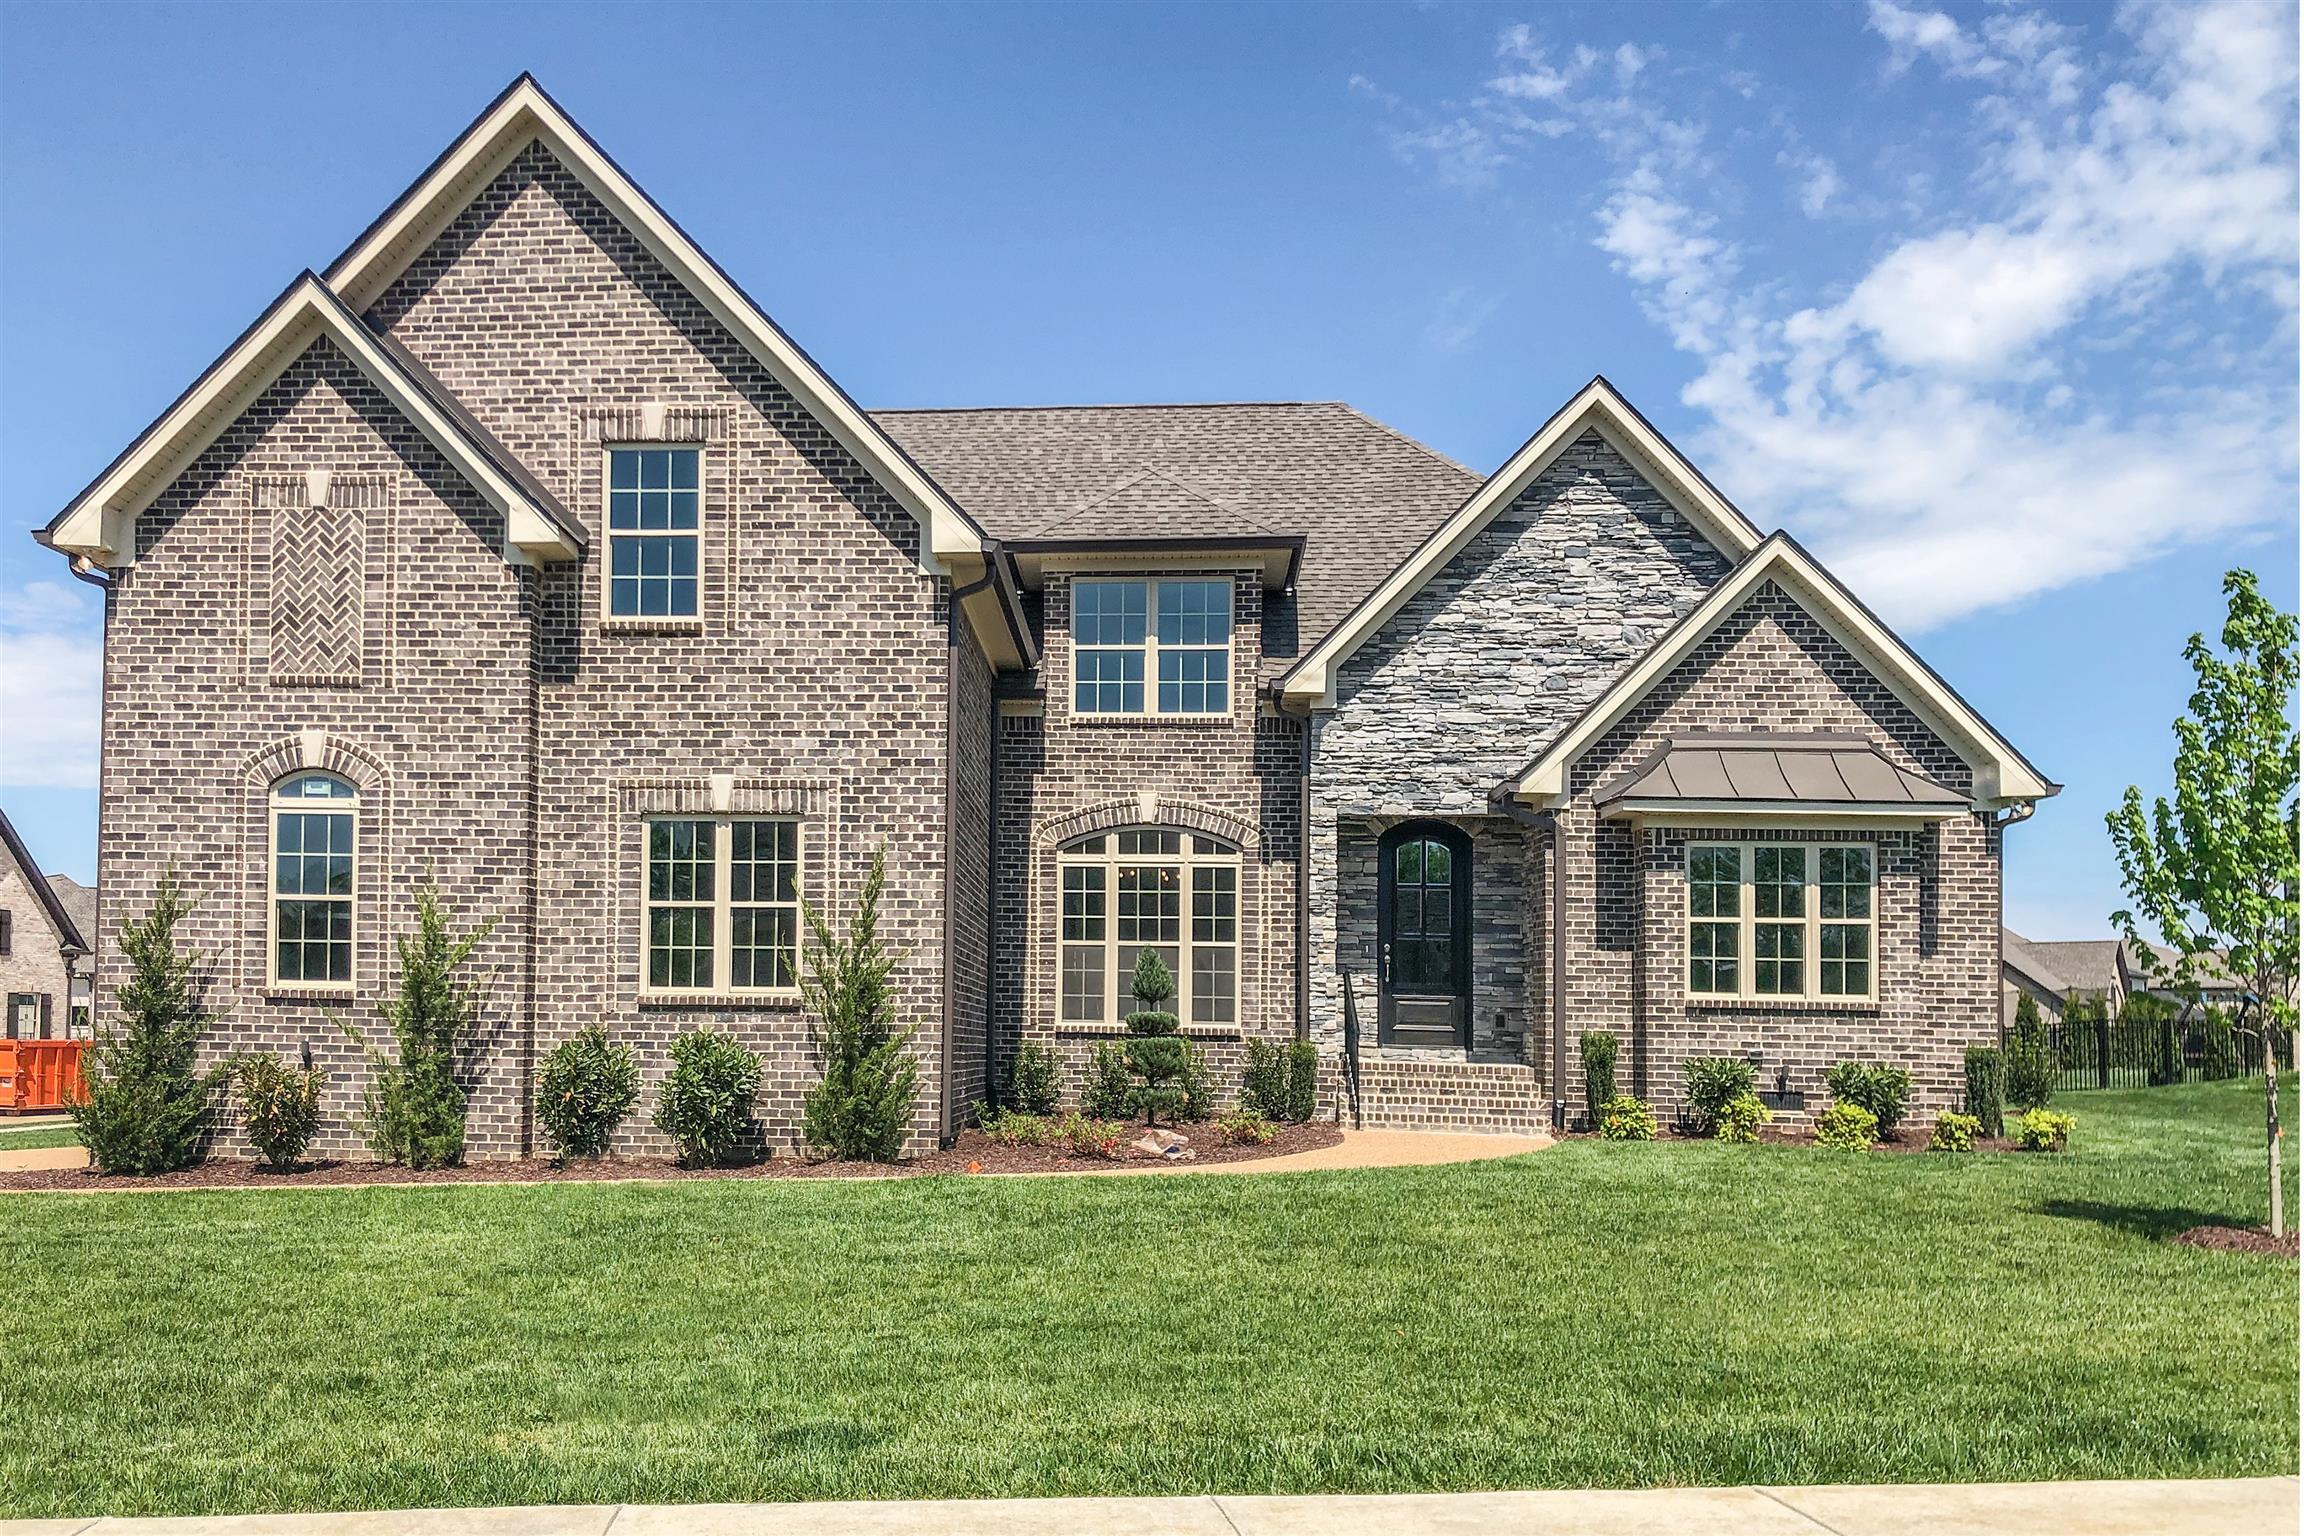 2024 Autumn Ridge Way (Lot 274), Spring Hill, TN 37174 - Spring Hill, TN real estate listing